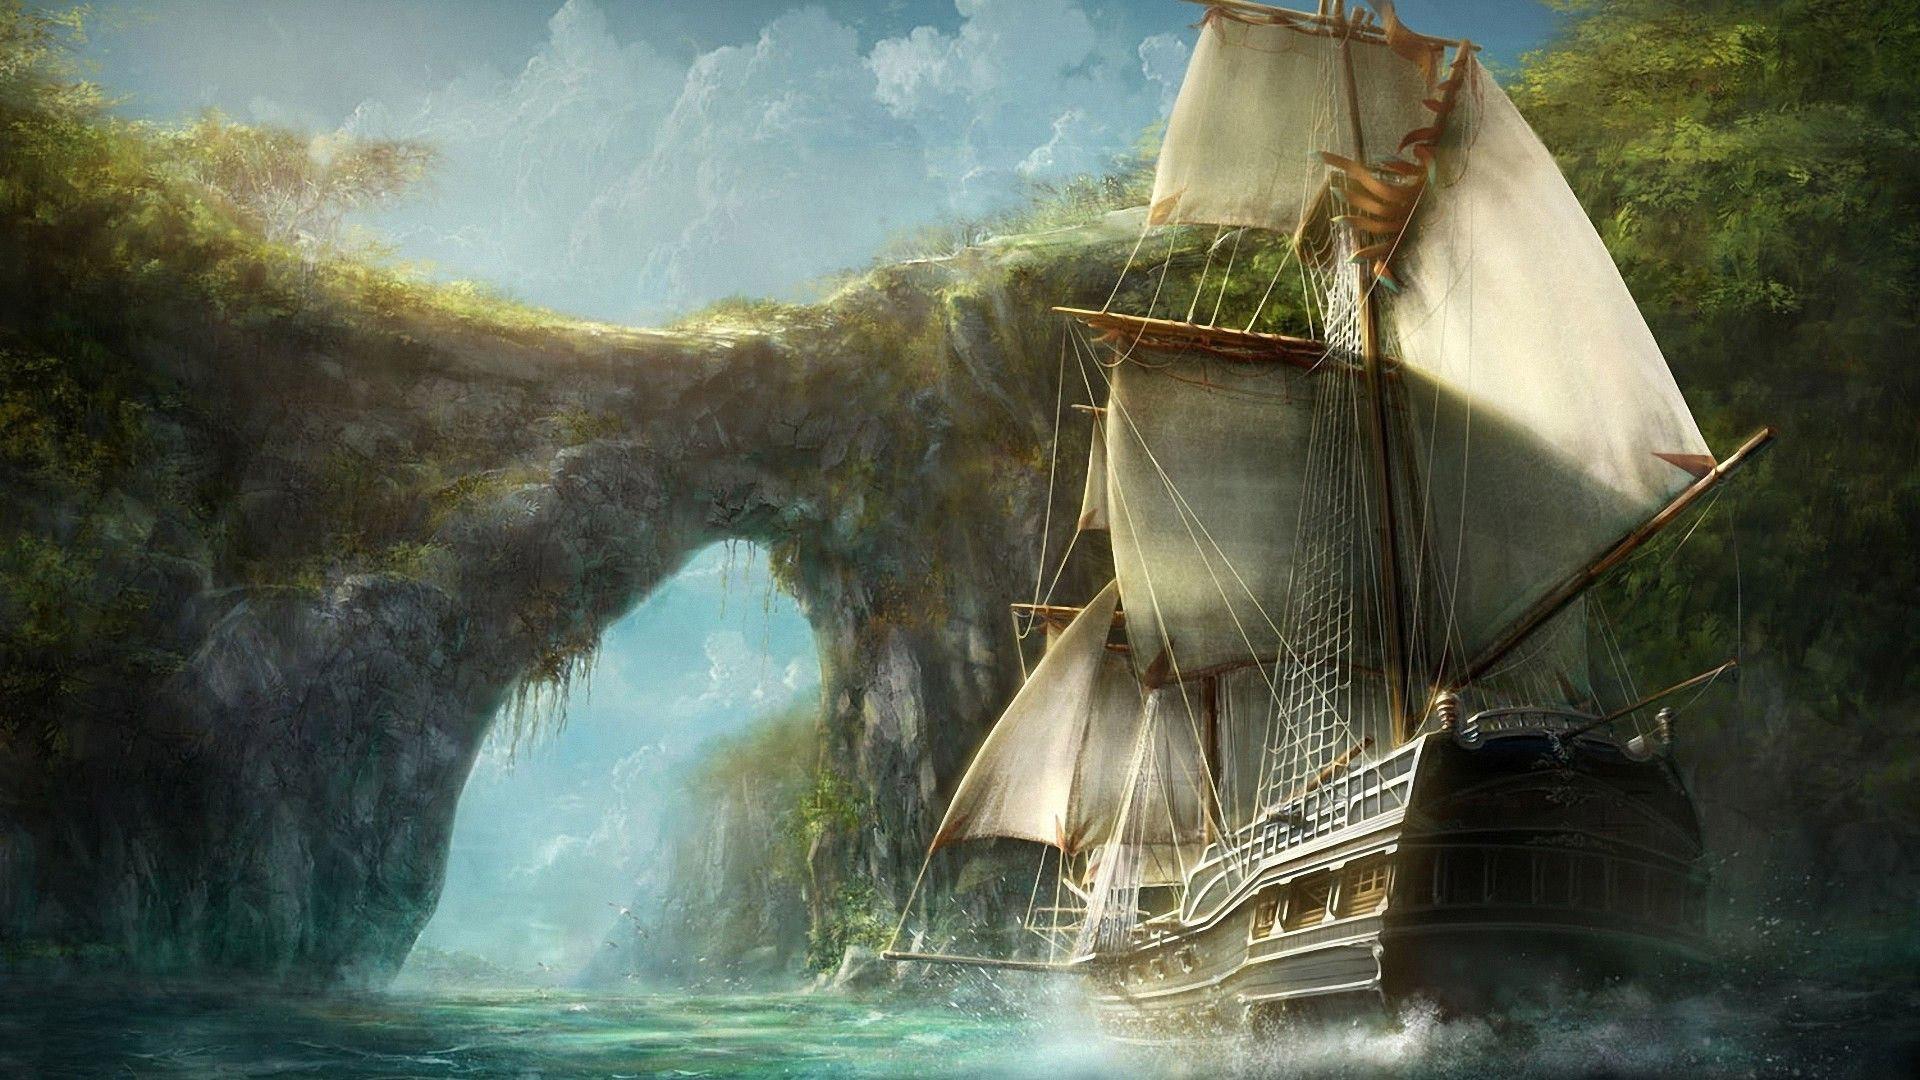 Ship Digital Art Bay Water Vehicle Rocks Pirates Jungle Caribbean Old Ghost Screenshot 1920x1080